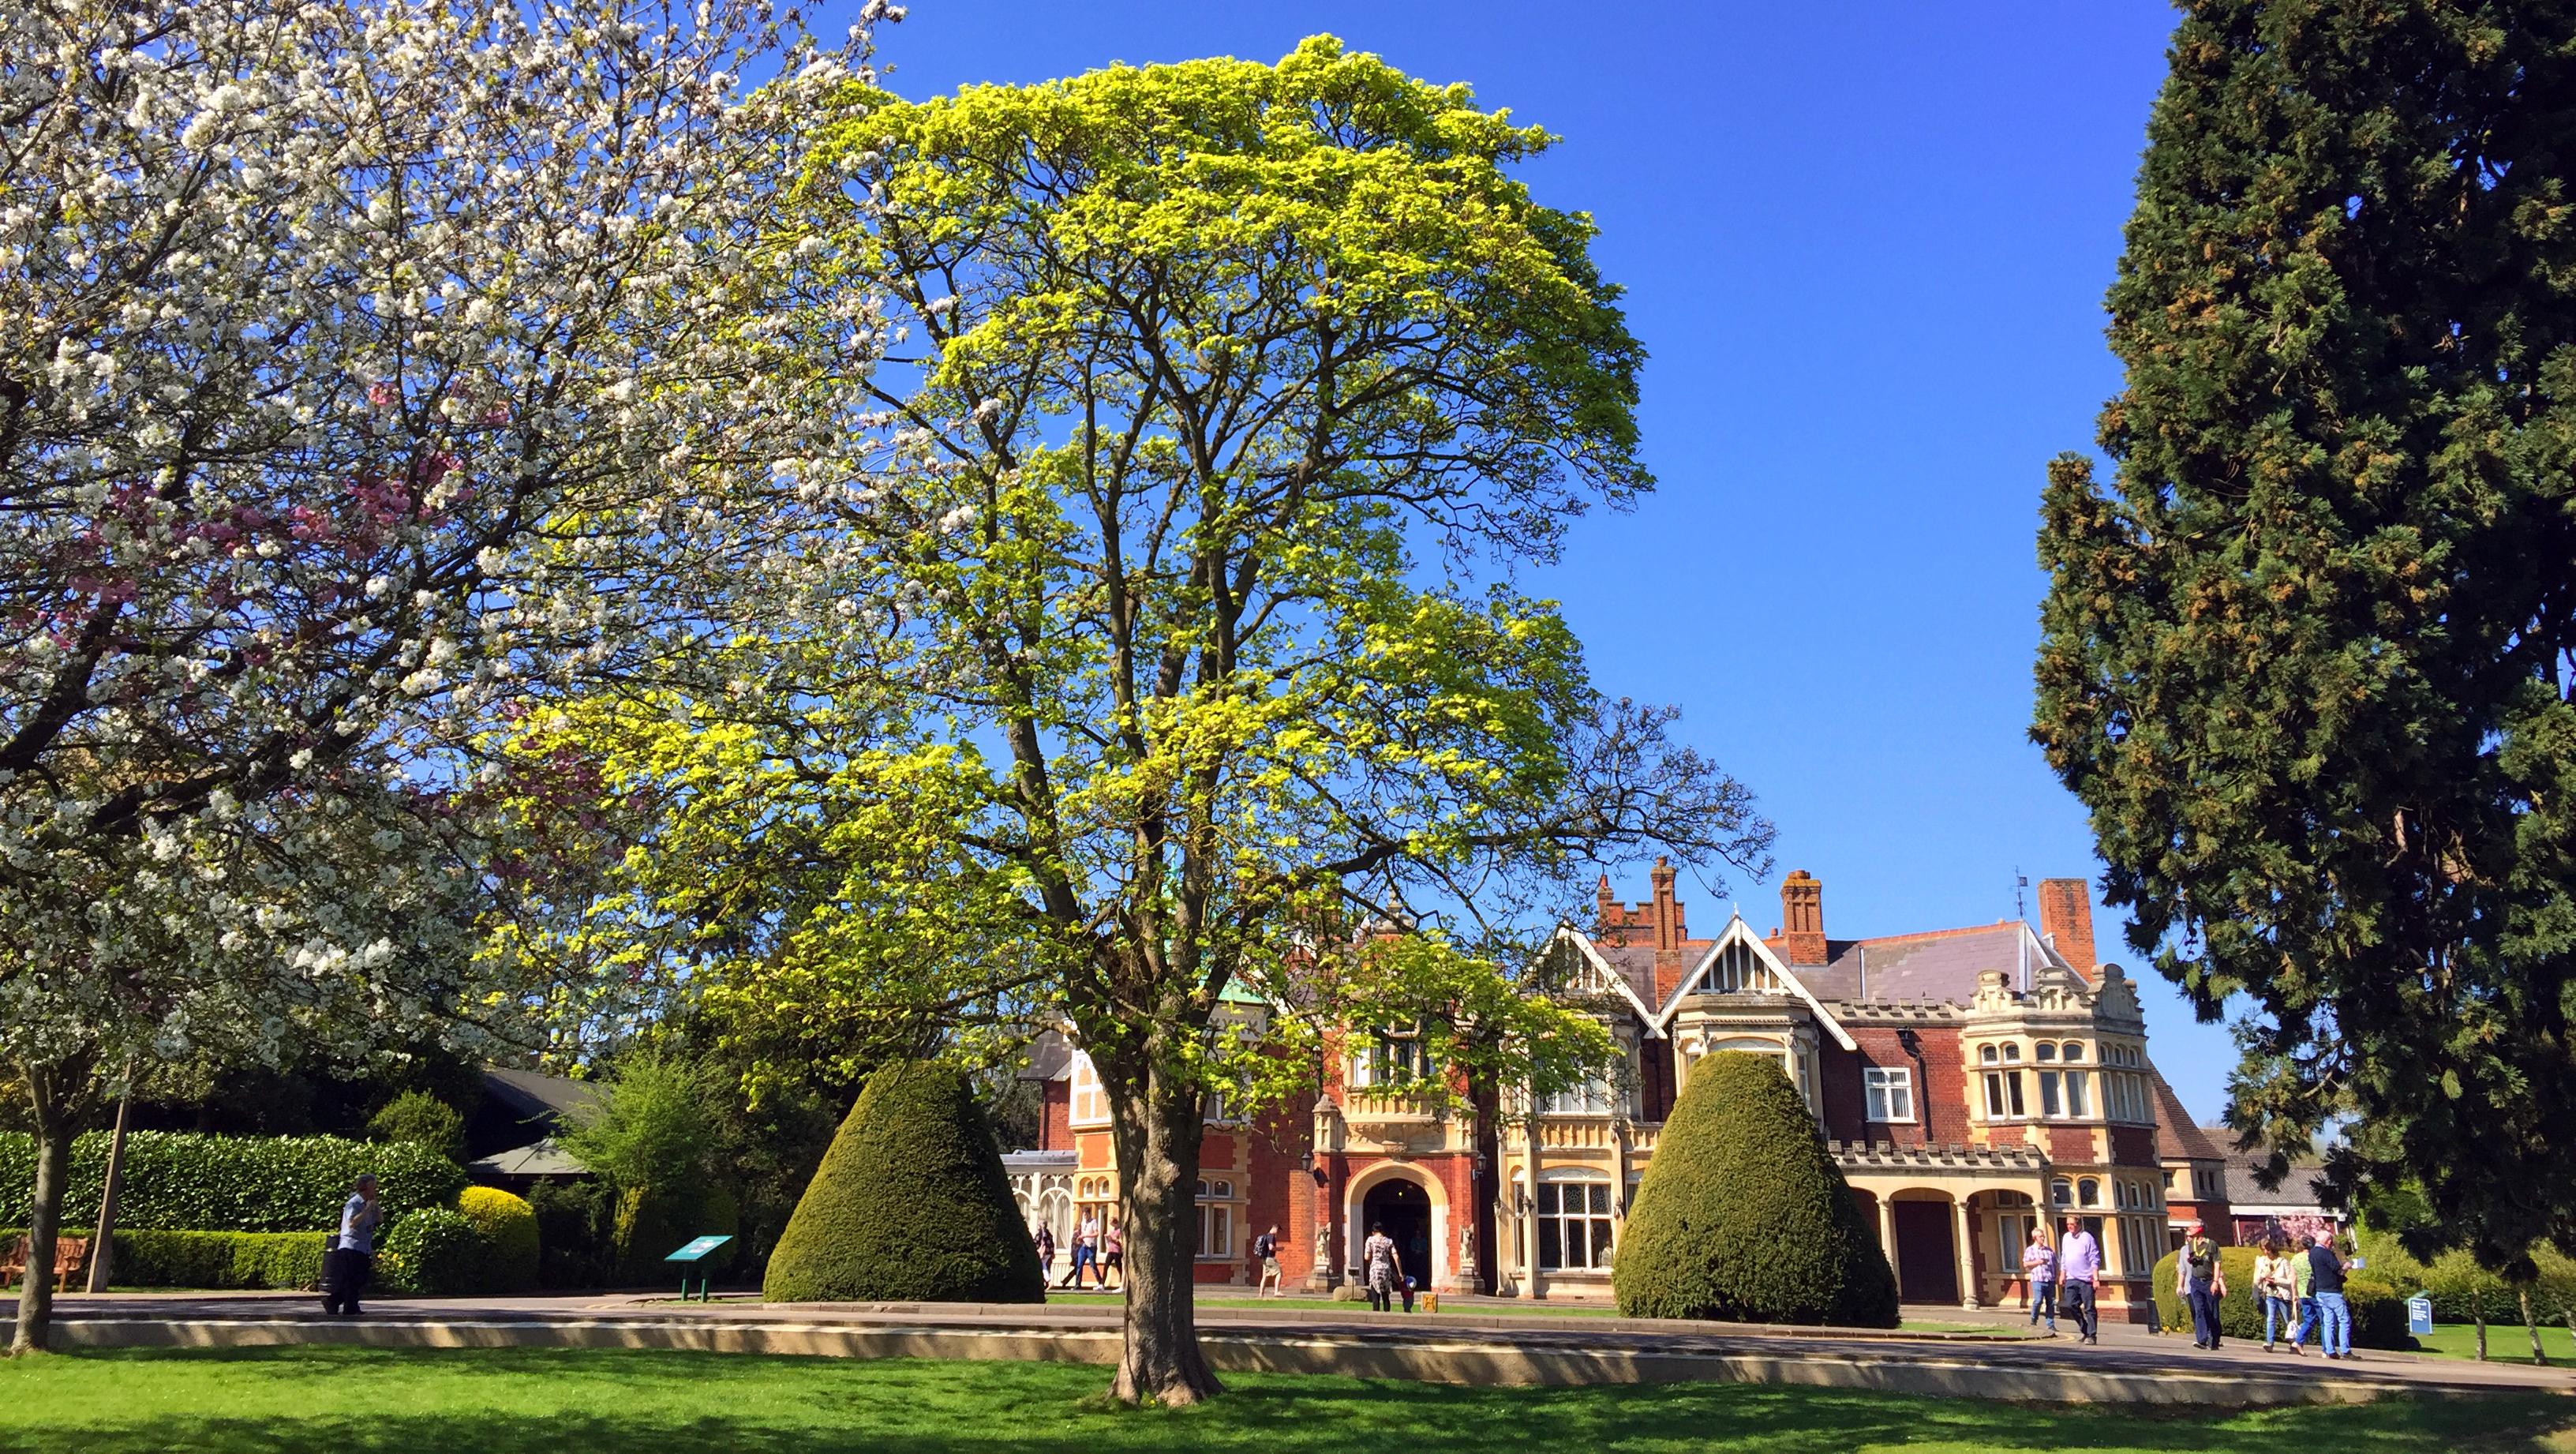 Bletchey Park, Inglaterra bletchley park - 24943050188 4cc87c9847 o - Bletchley Park, el secreto mejor guardado de Inglaterra